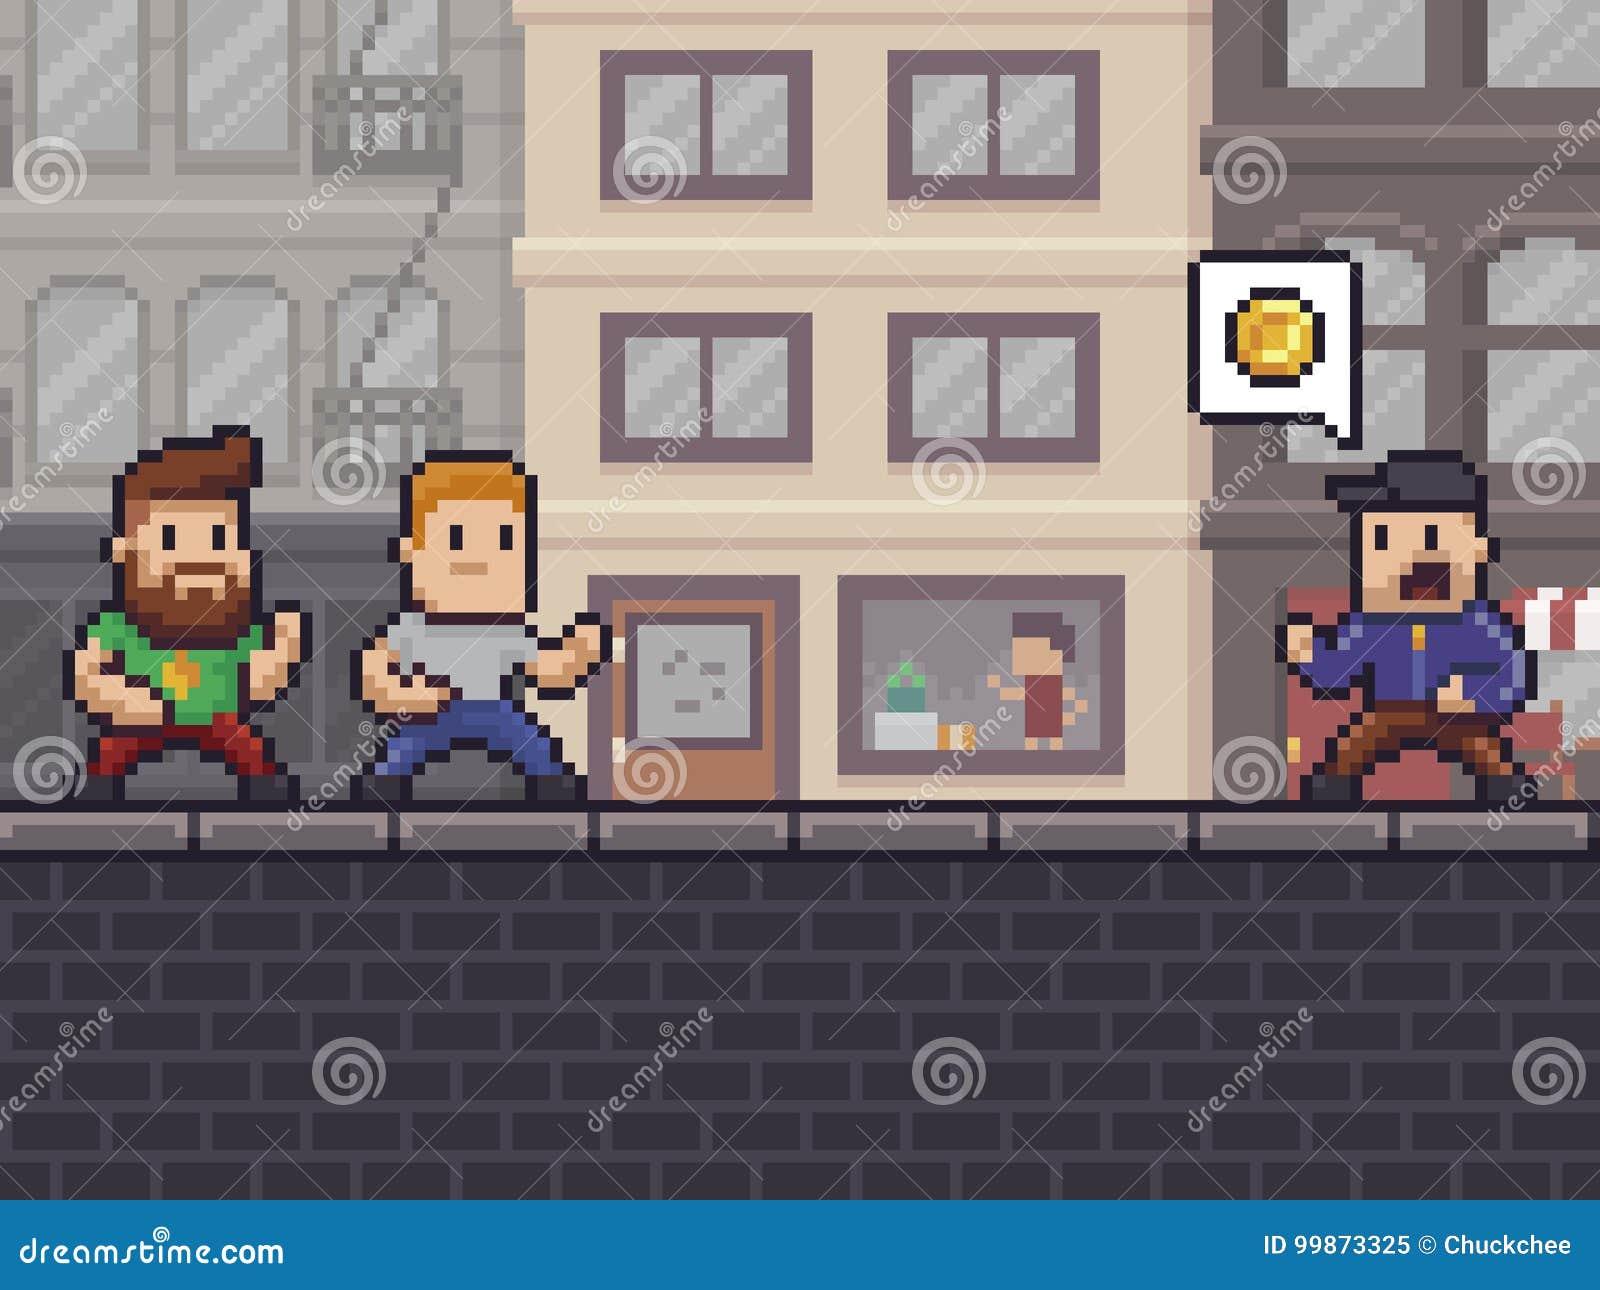 Pixel Art Robbery